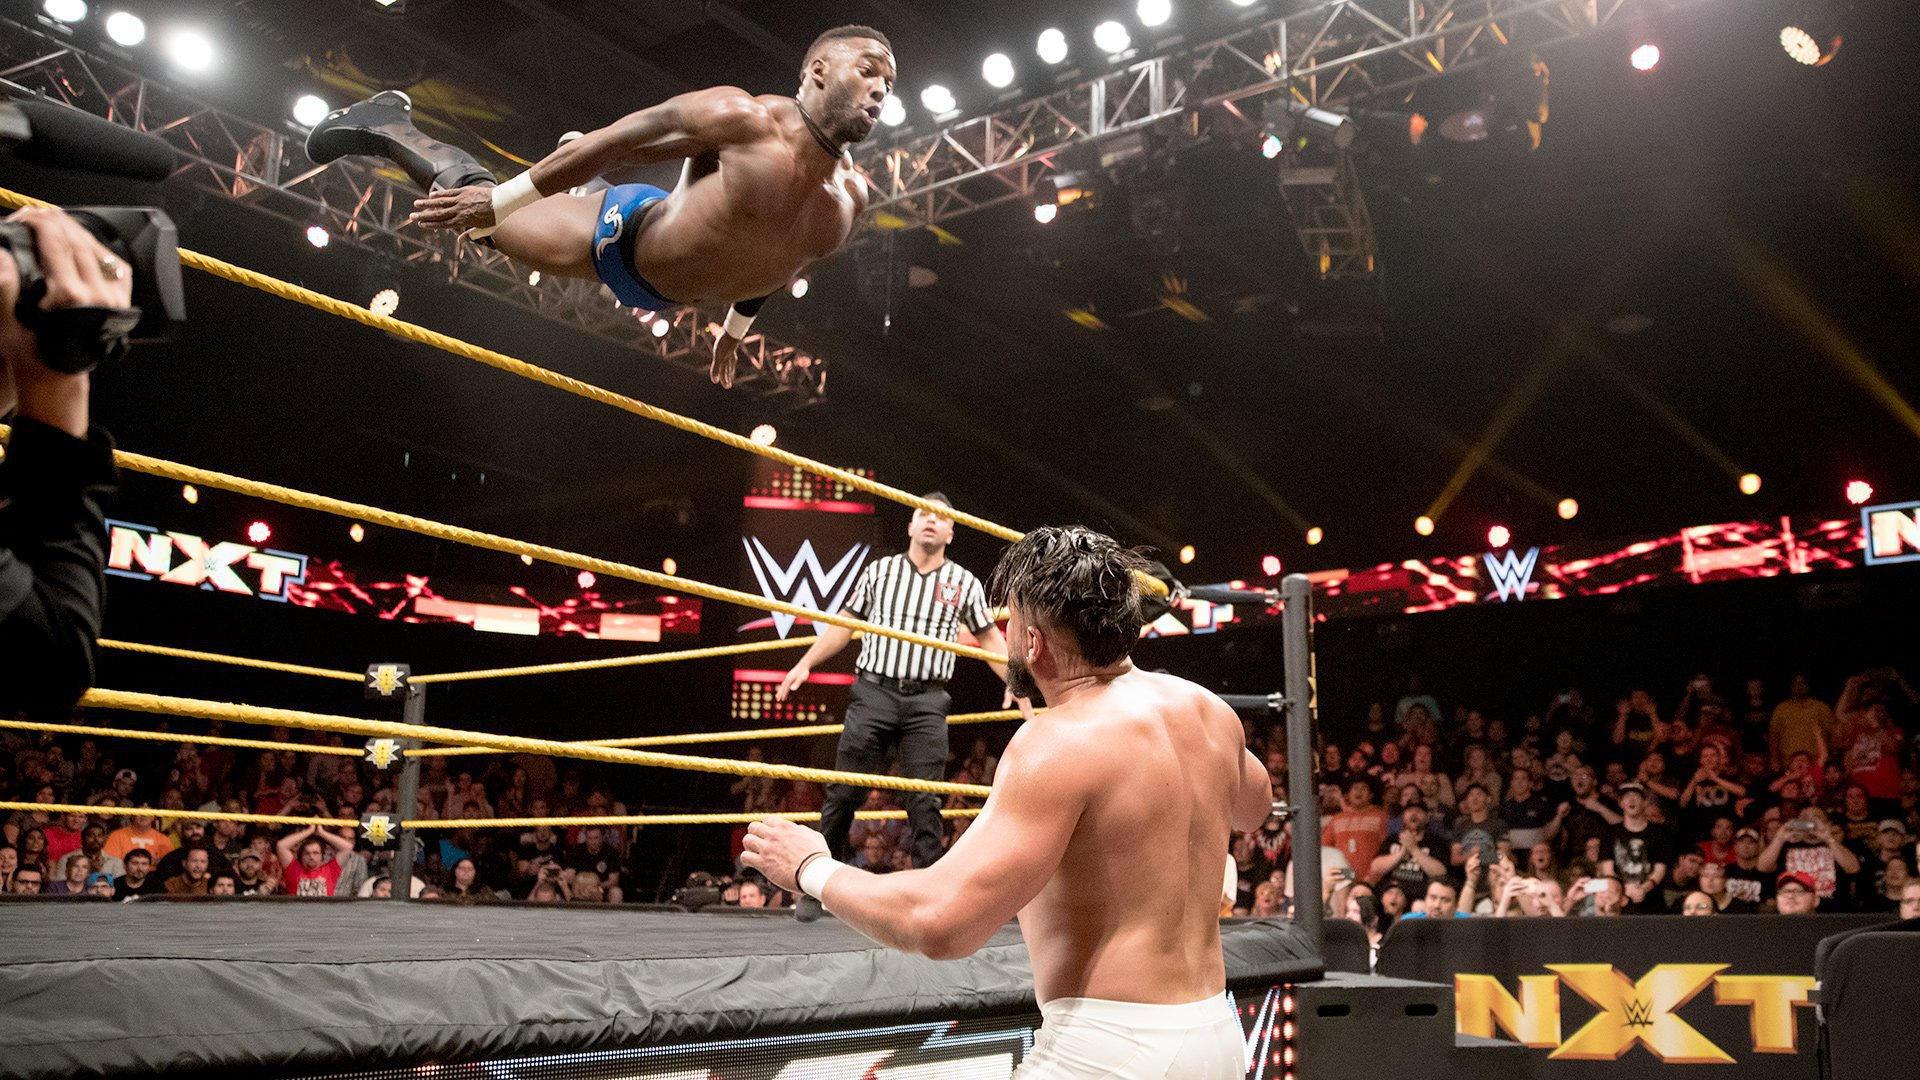 Resultats WWE NXT 21 septembre